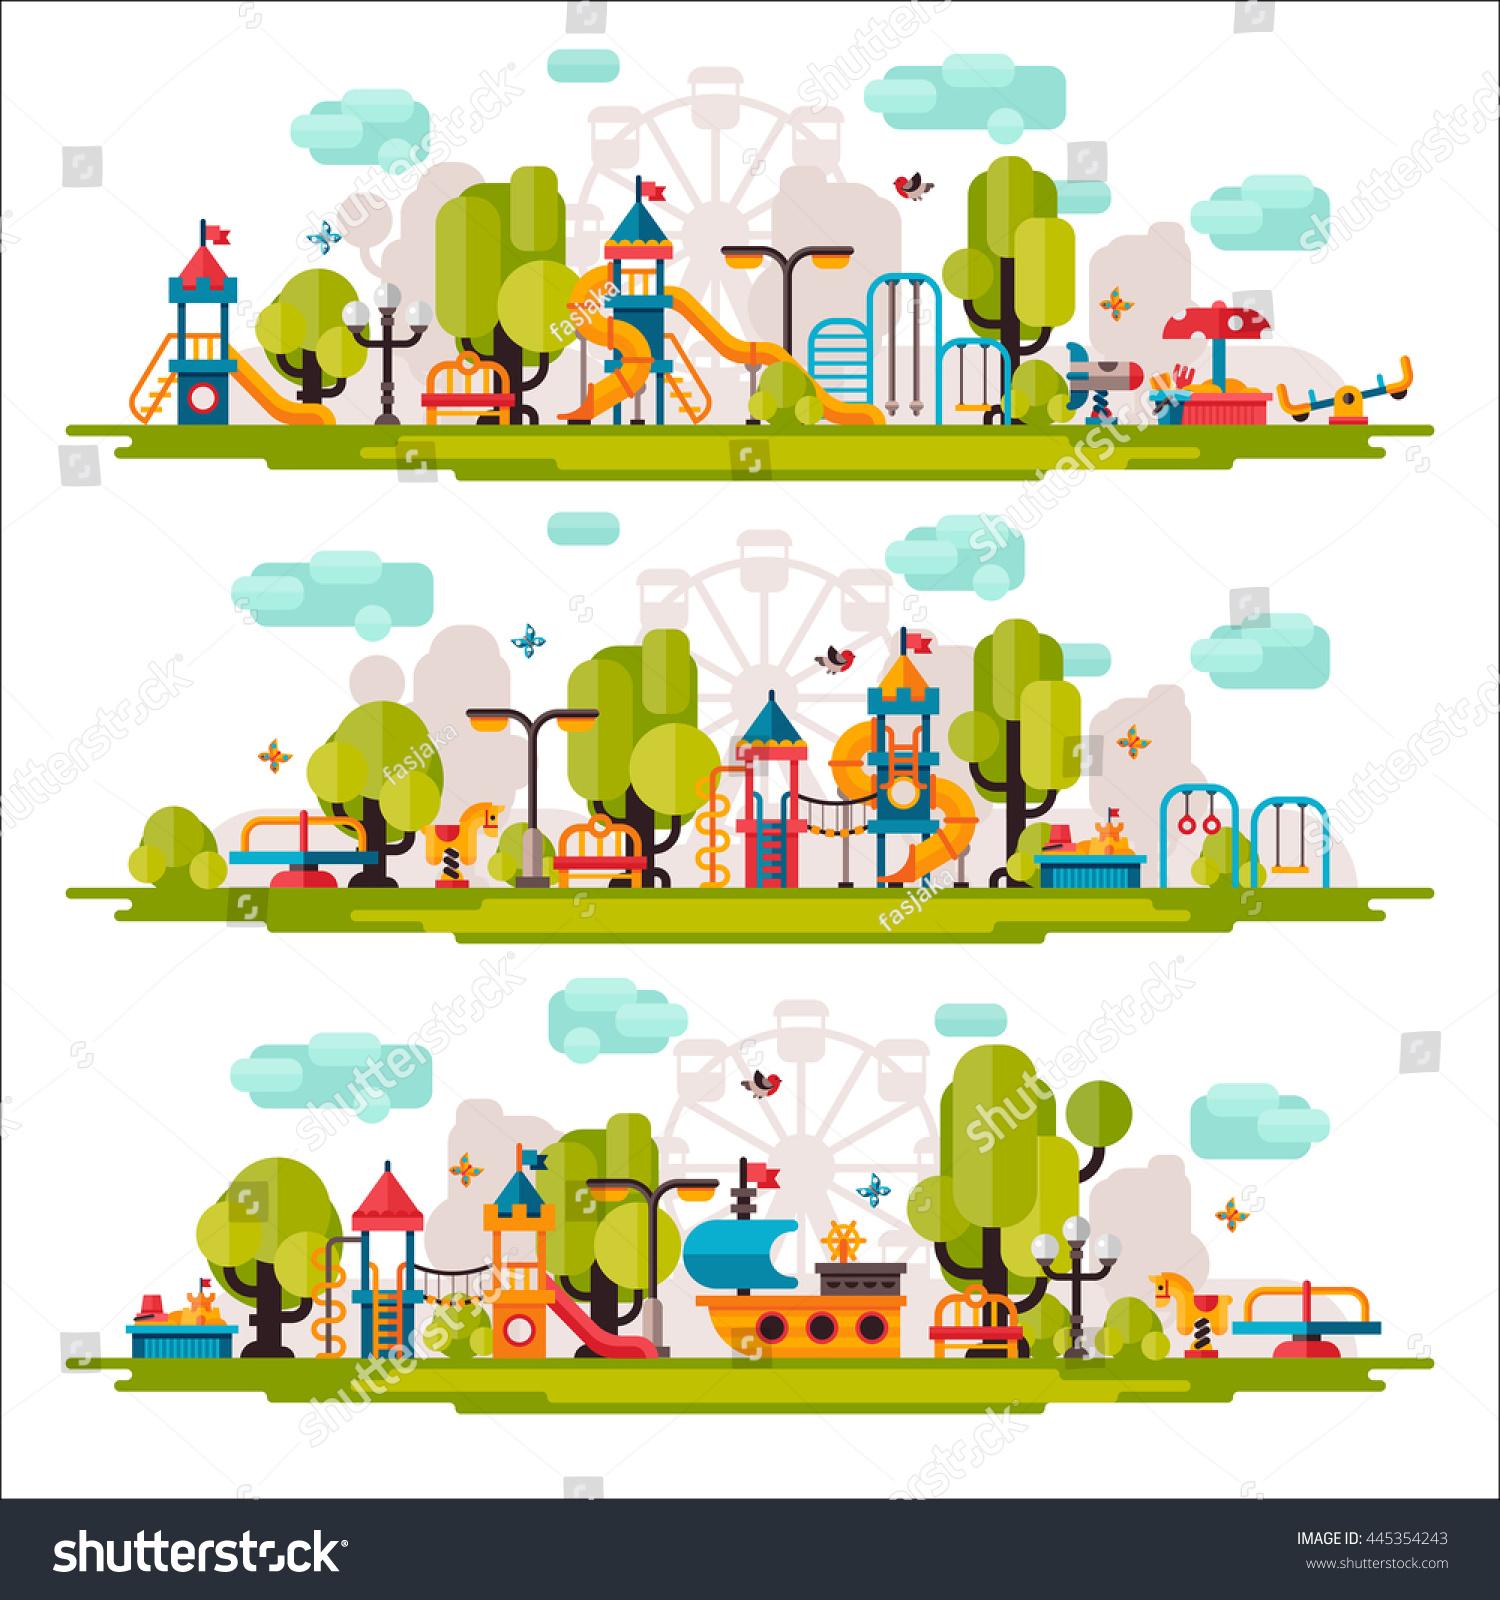 Free Clip Art Images Online